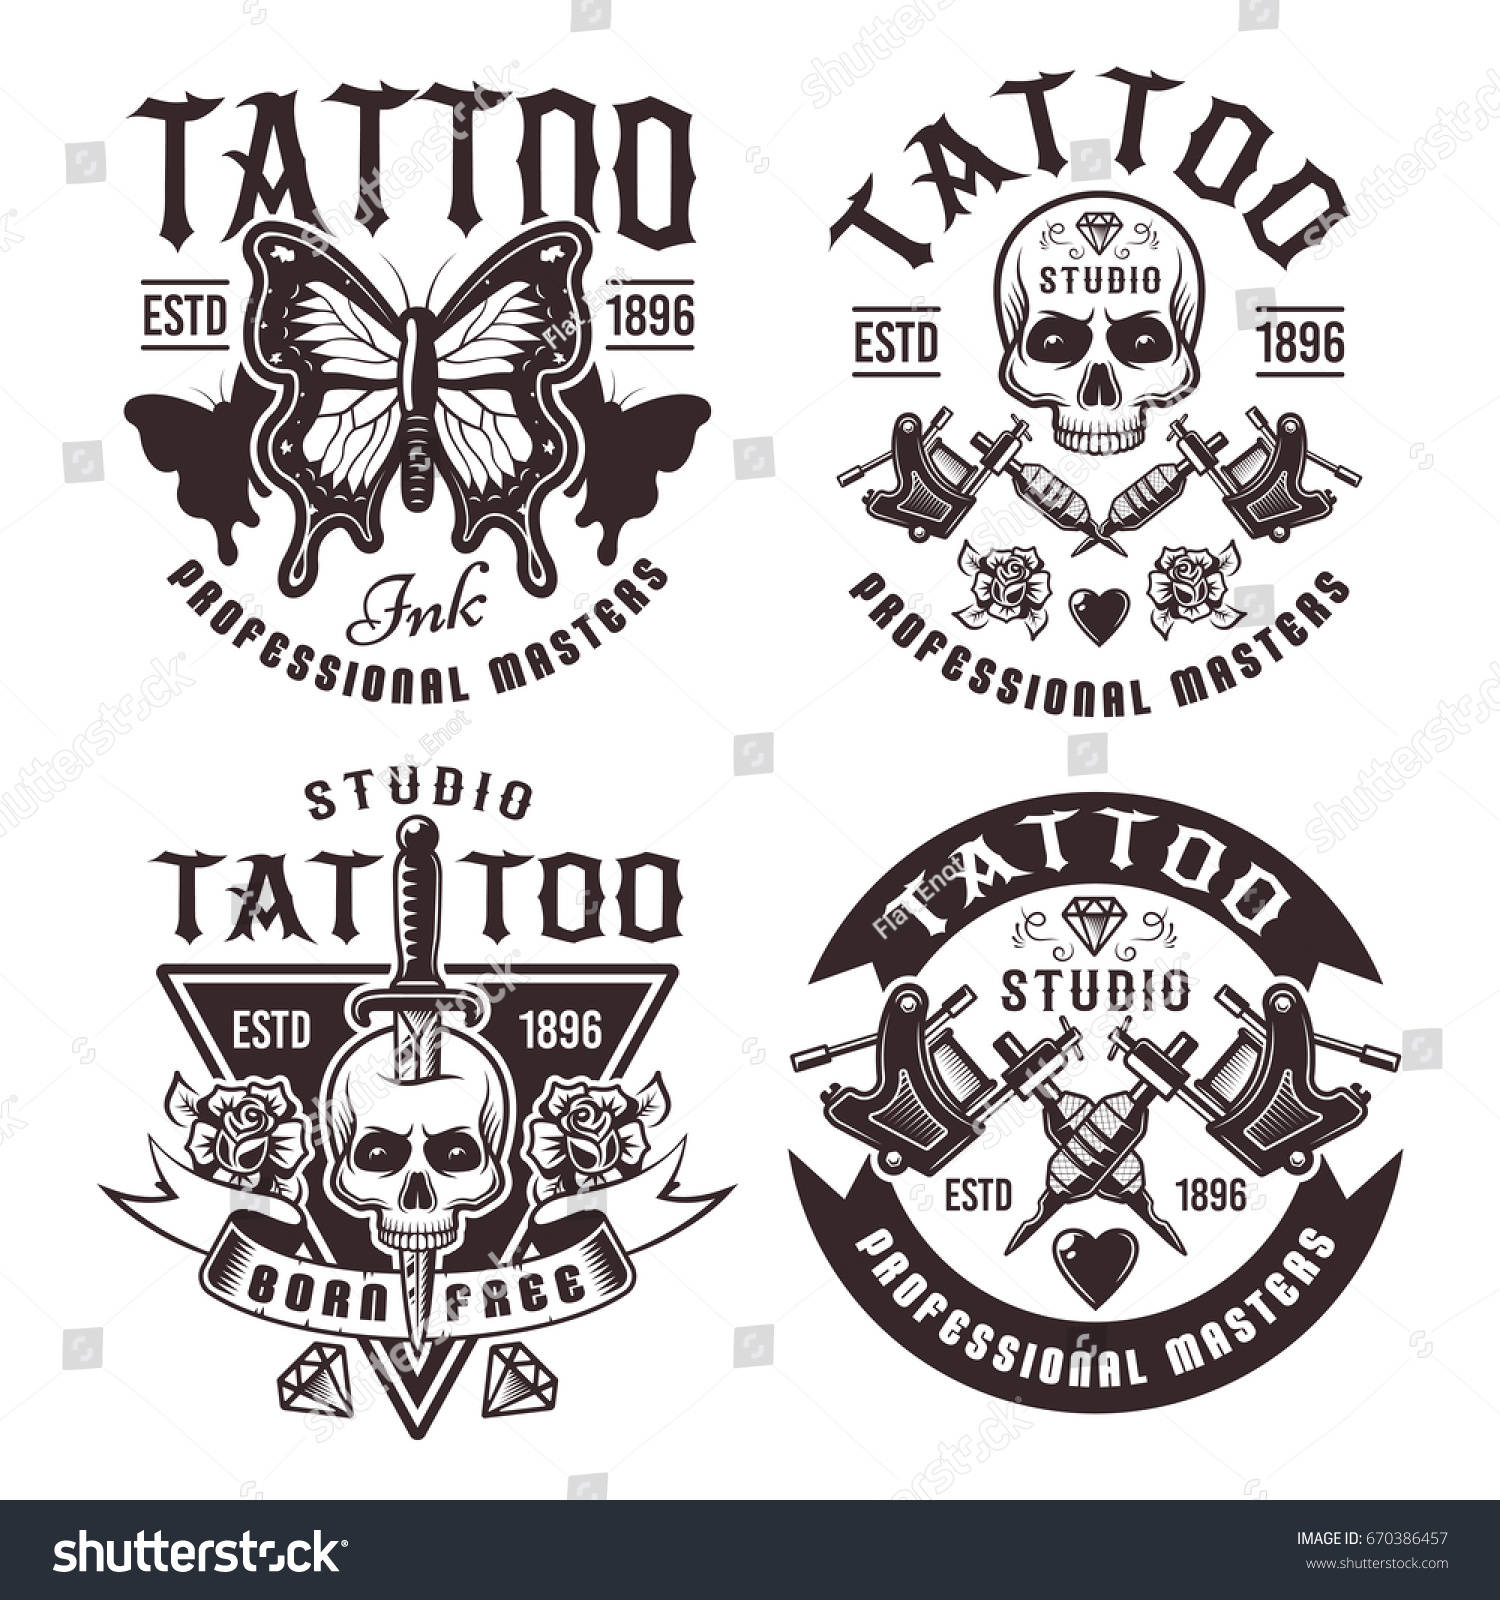 Tattoo studio set four vector vintage stock vector for Vintage tattoo art parlor